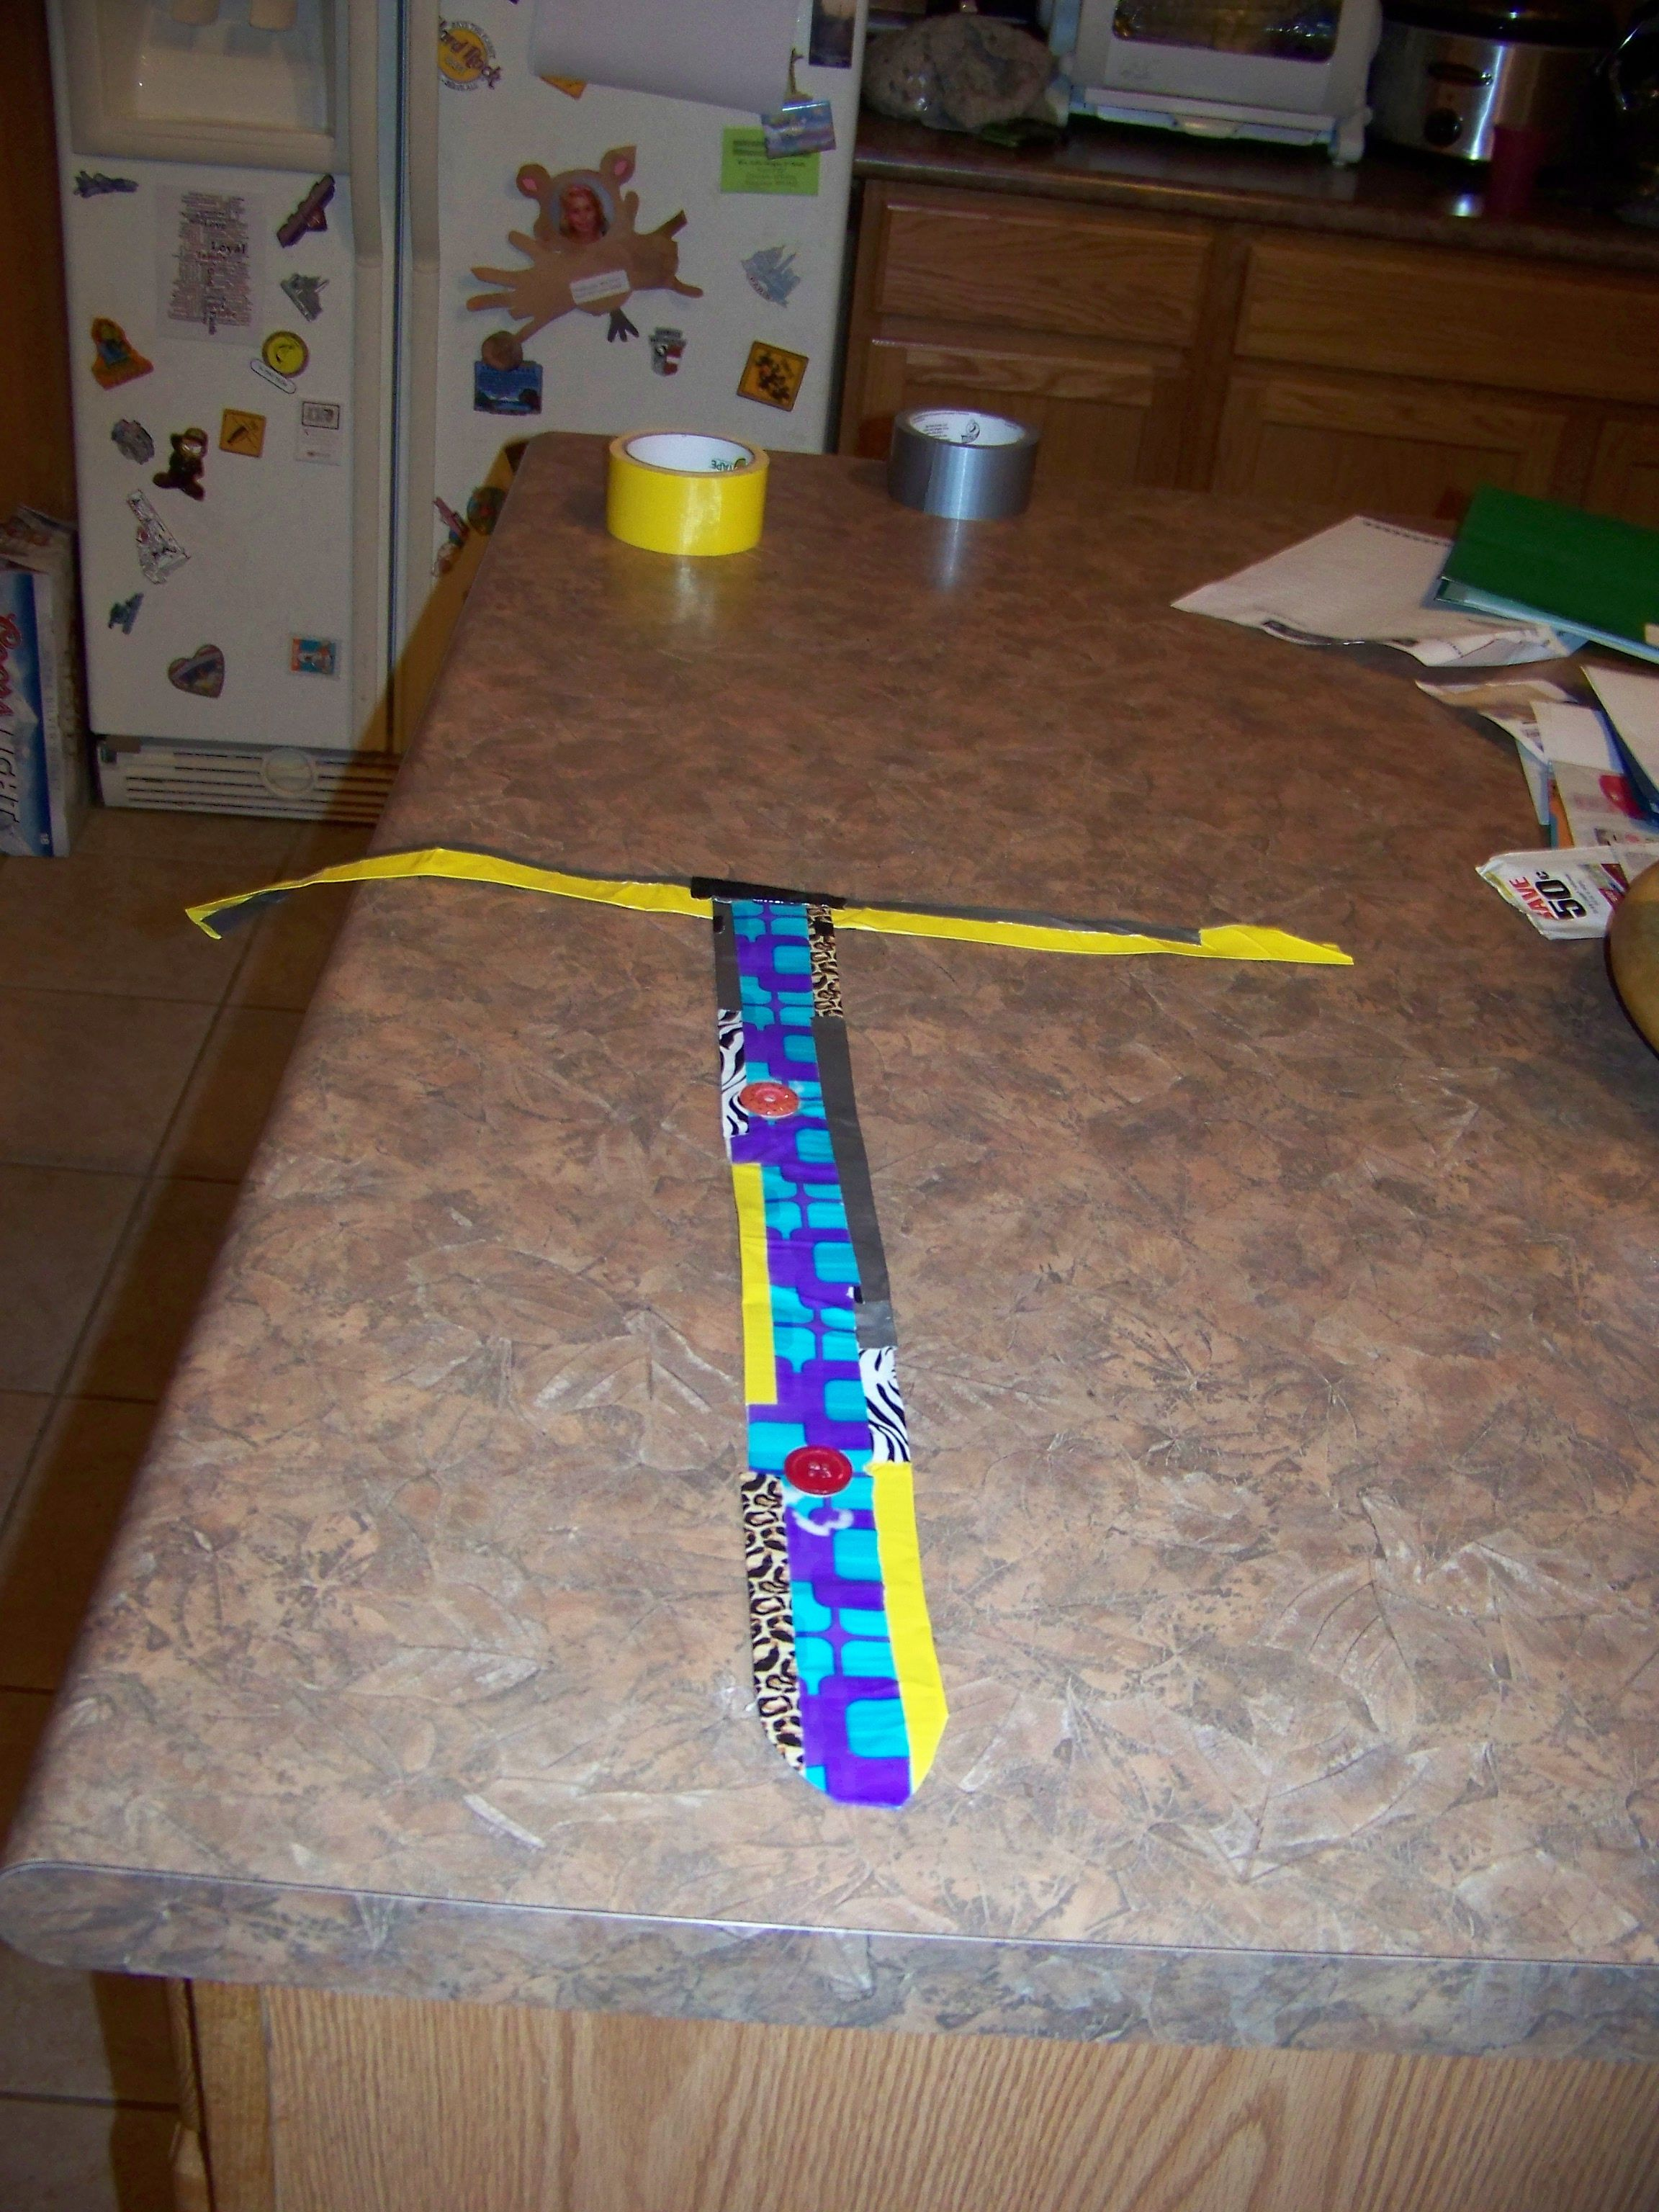 Crazy Tie Duct Tape Reversible For Awana Crazy Tie Night